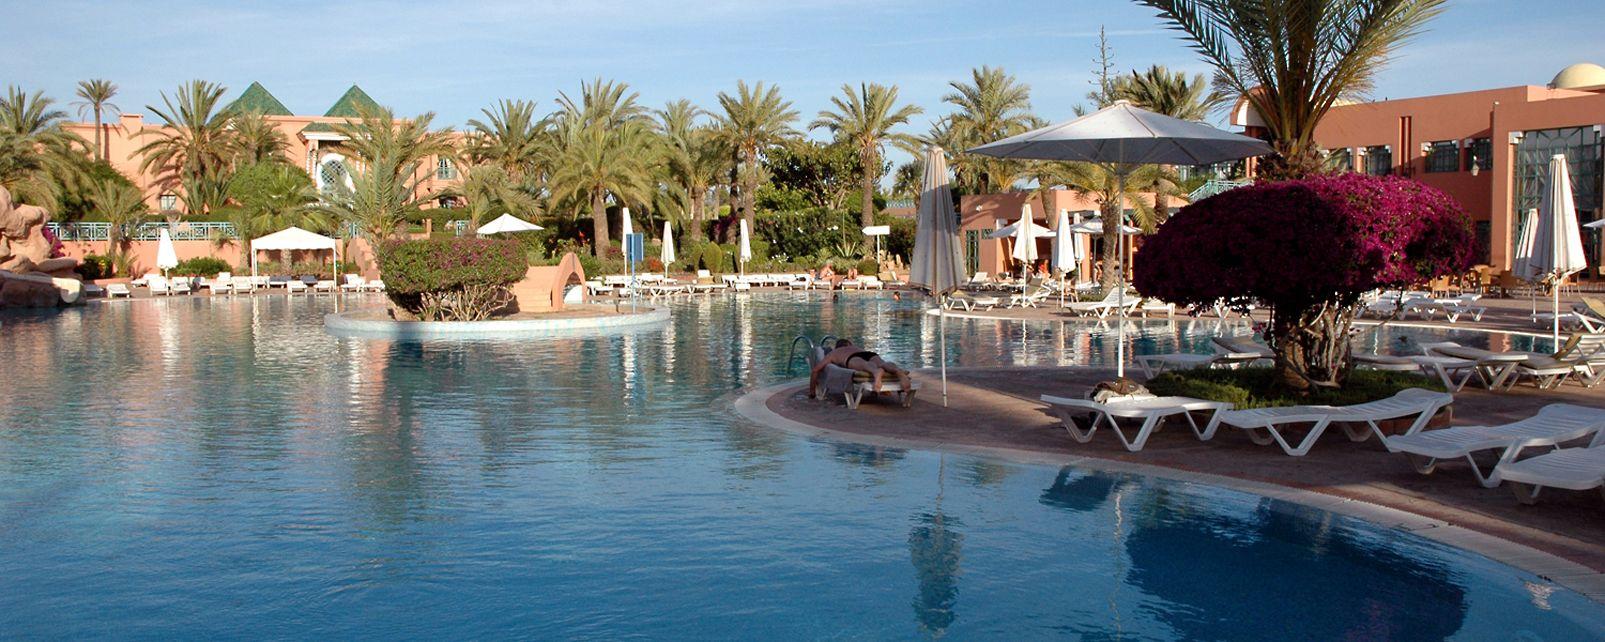 Hotel Sangho Marrakech